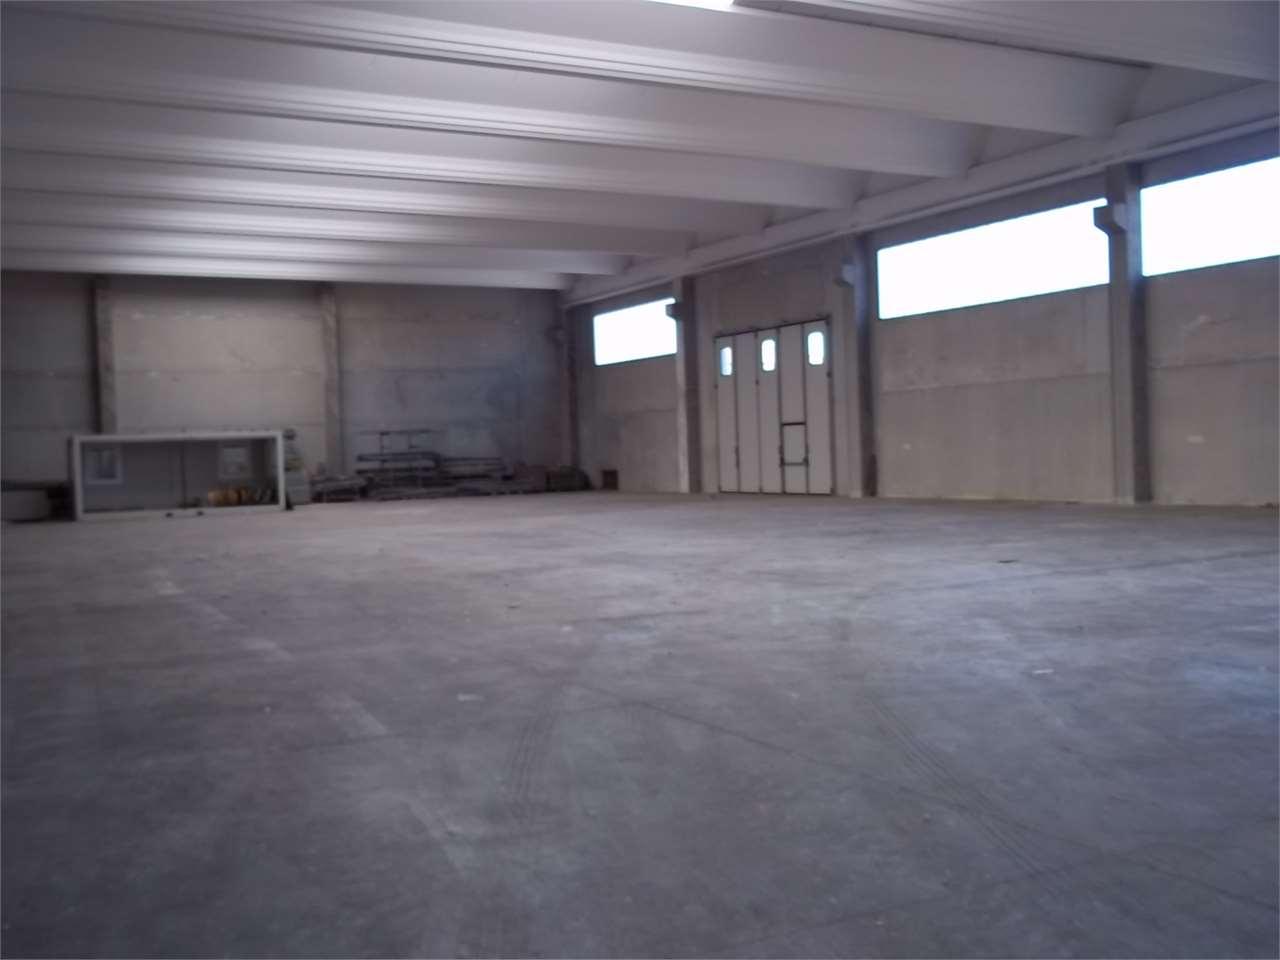 Vendita capannone/magazzino Novara